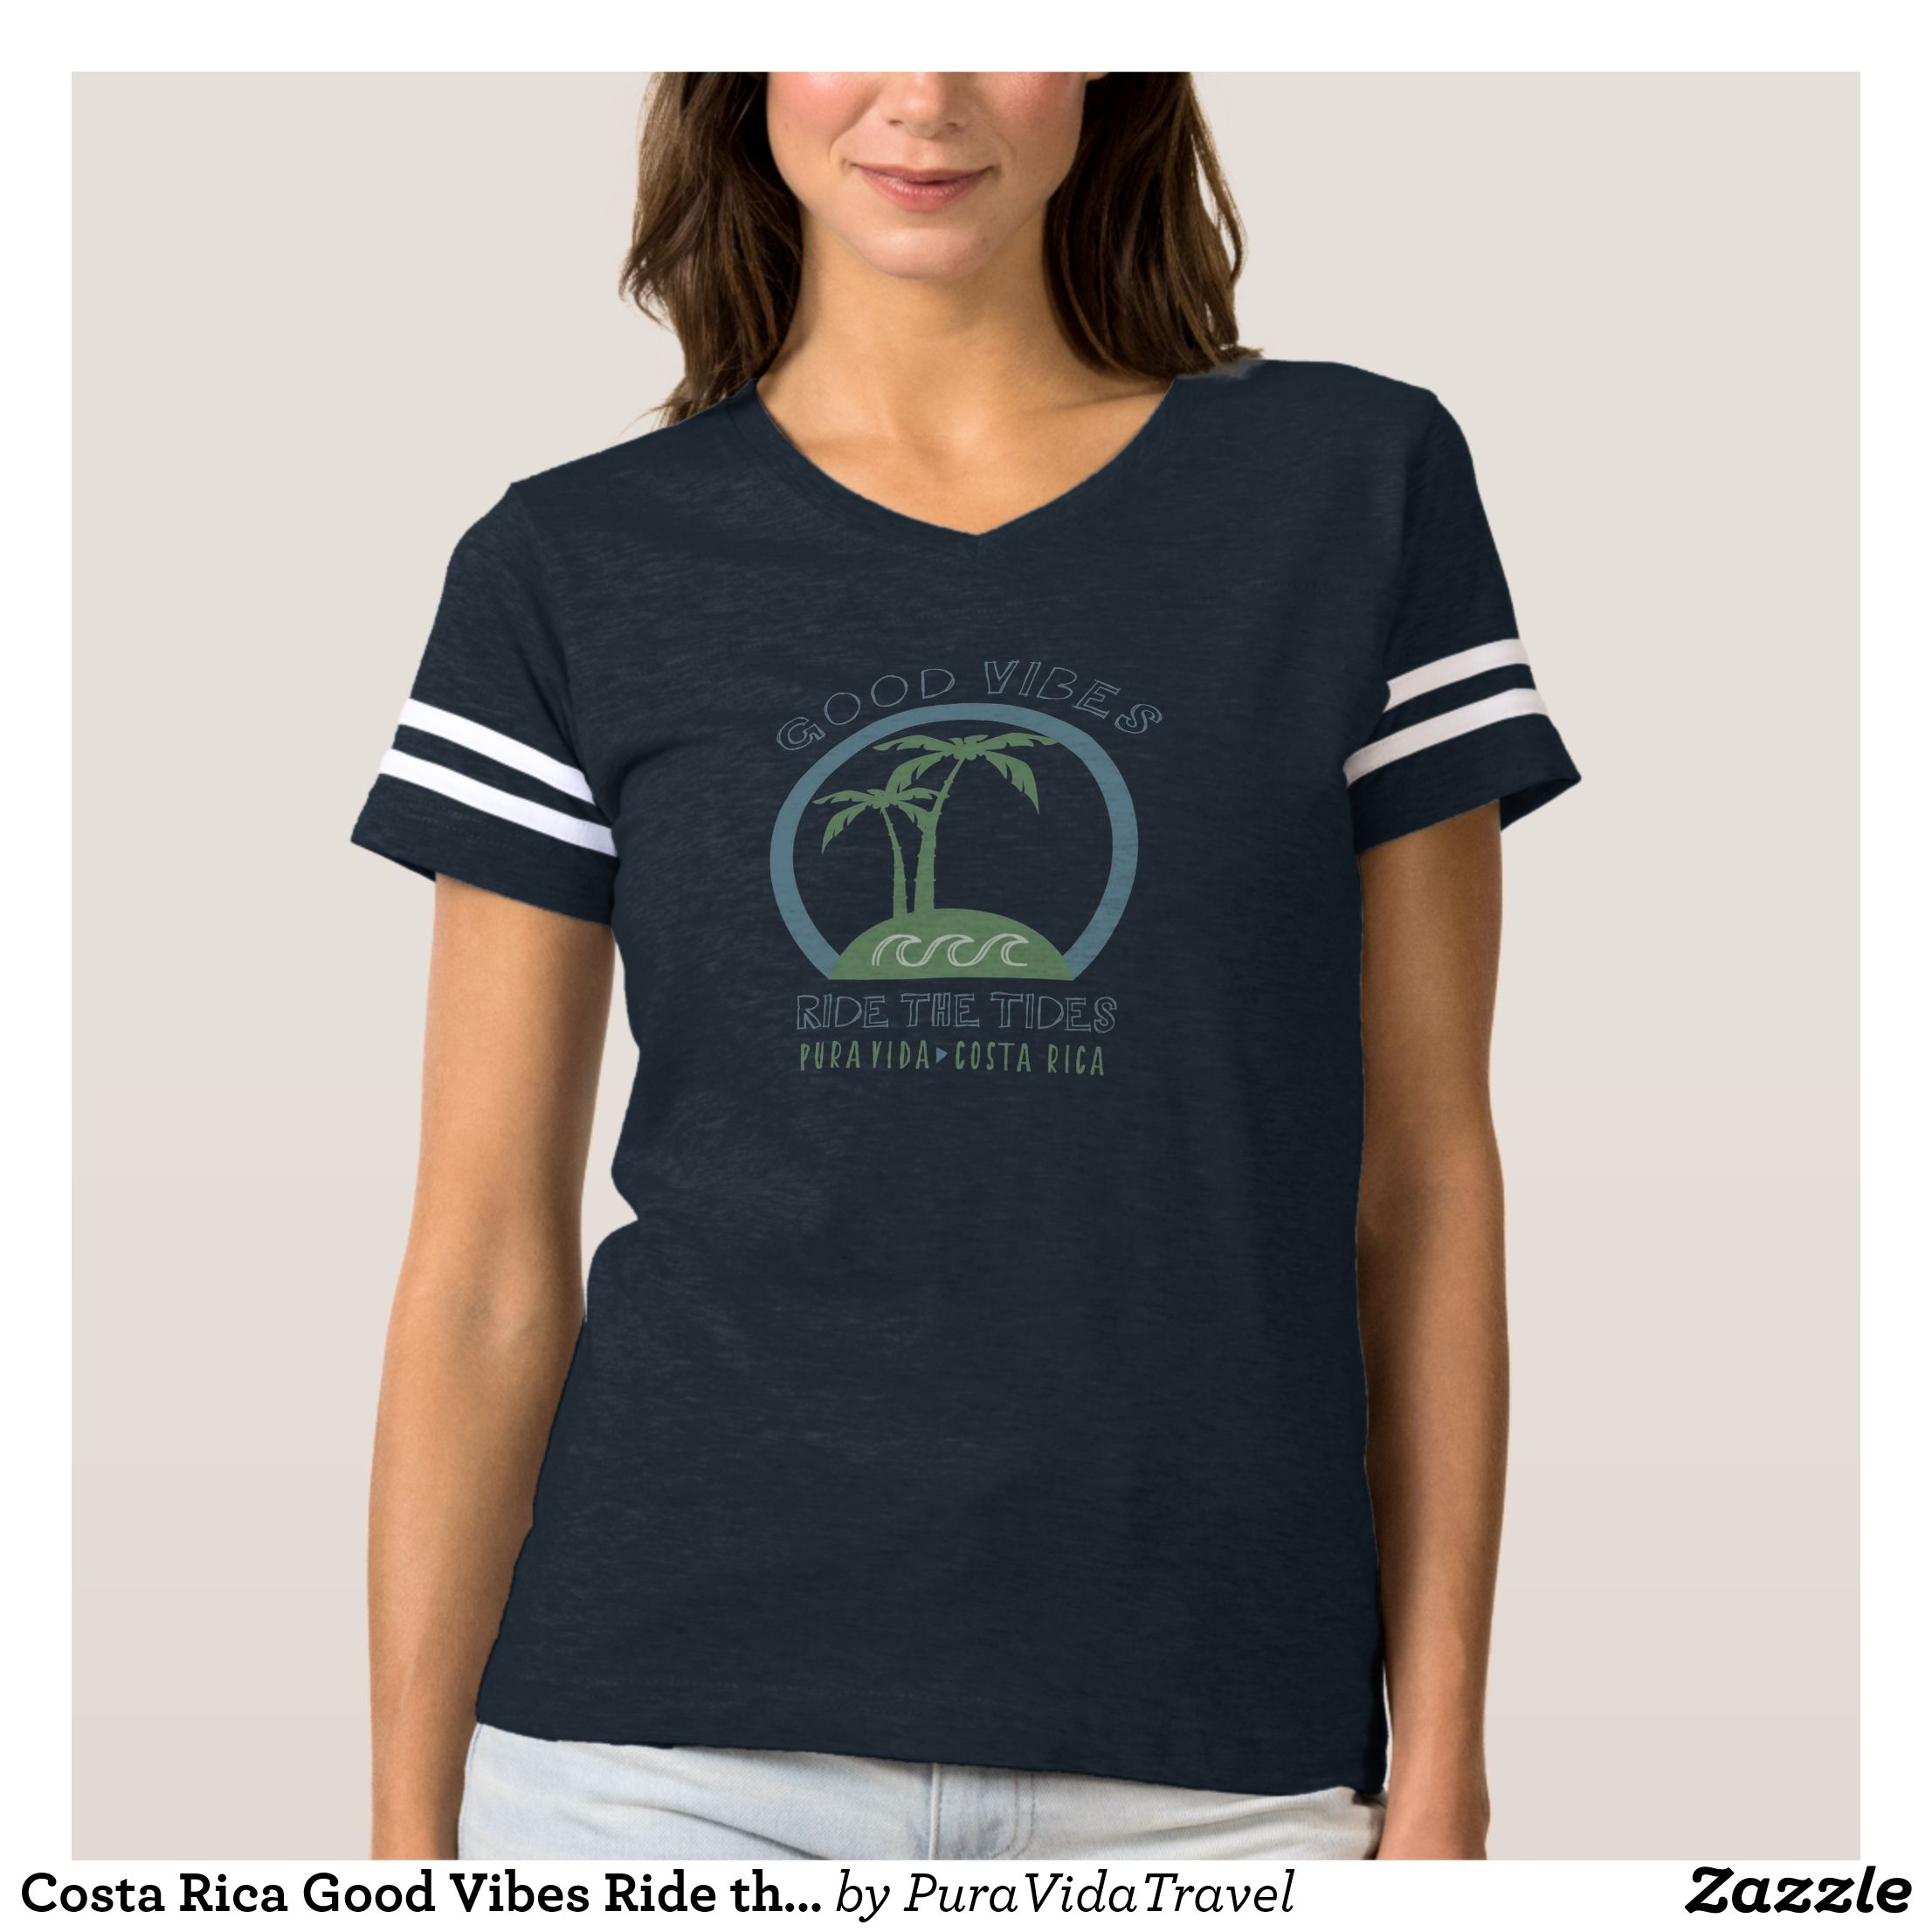 04688594d1d Good Ride Shirts For Sale - Cotswold Hire